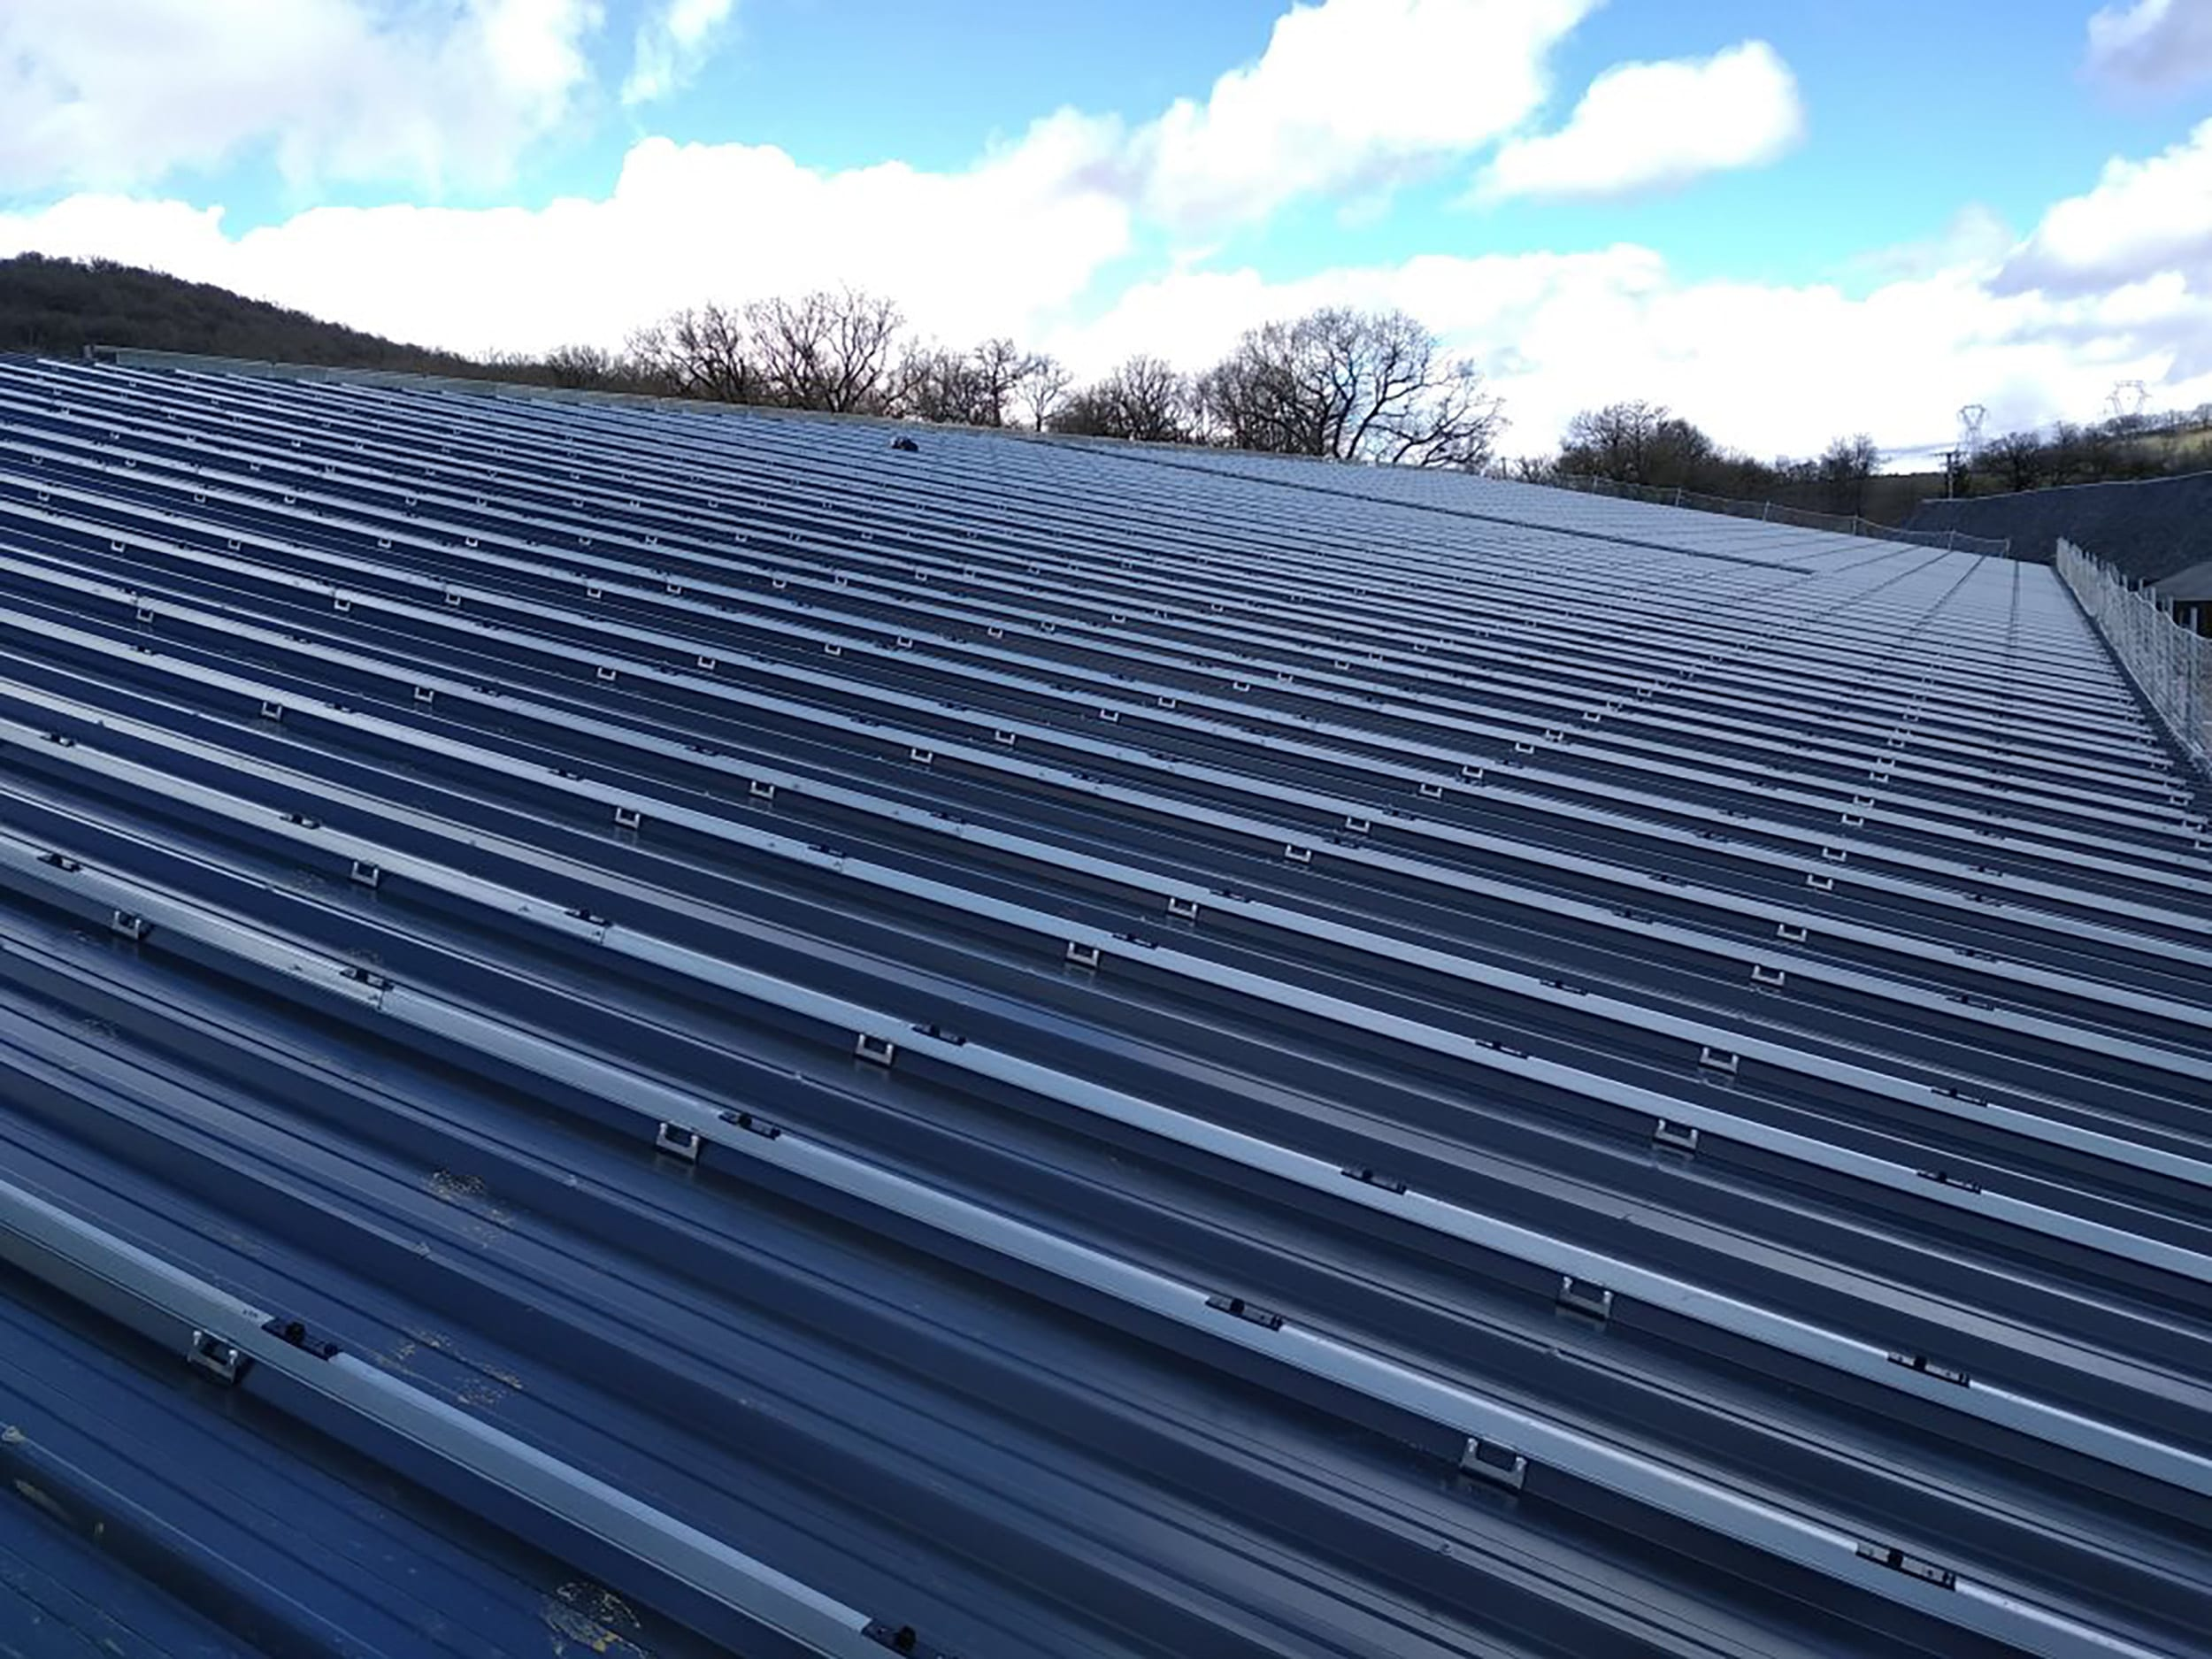 installation-toiture-photovoltaique-batiment-agricole-laveyron